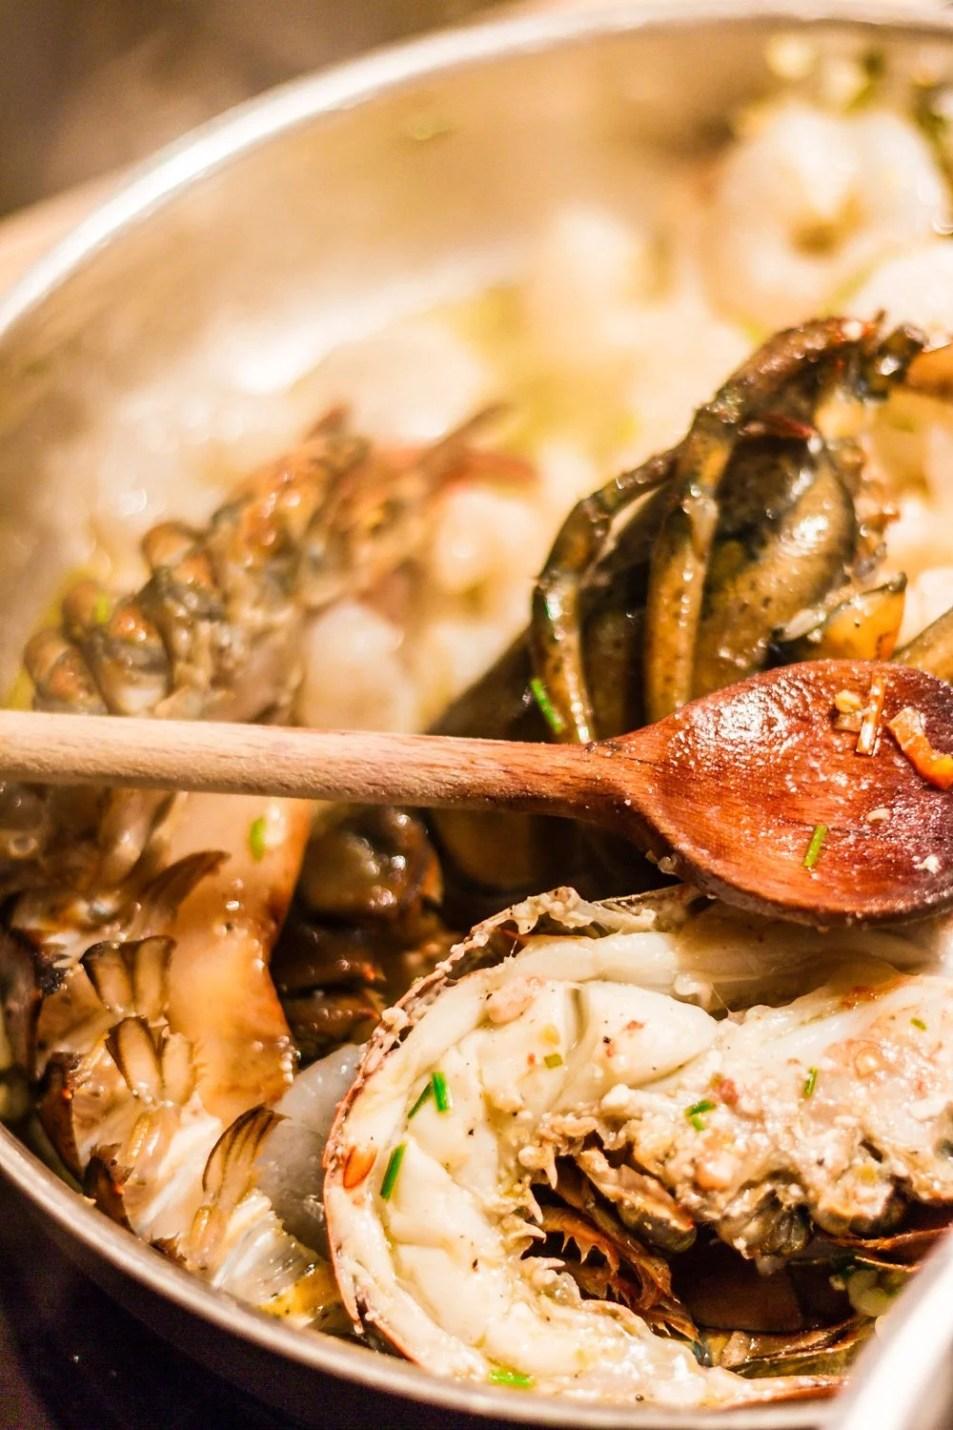 Nelson_Carvalheiro_Portuguese_Seafood_Rice_Recipe (14)